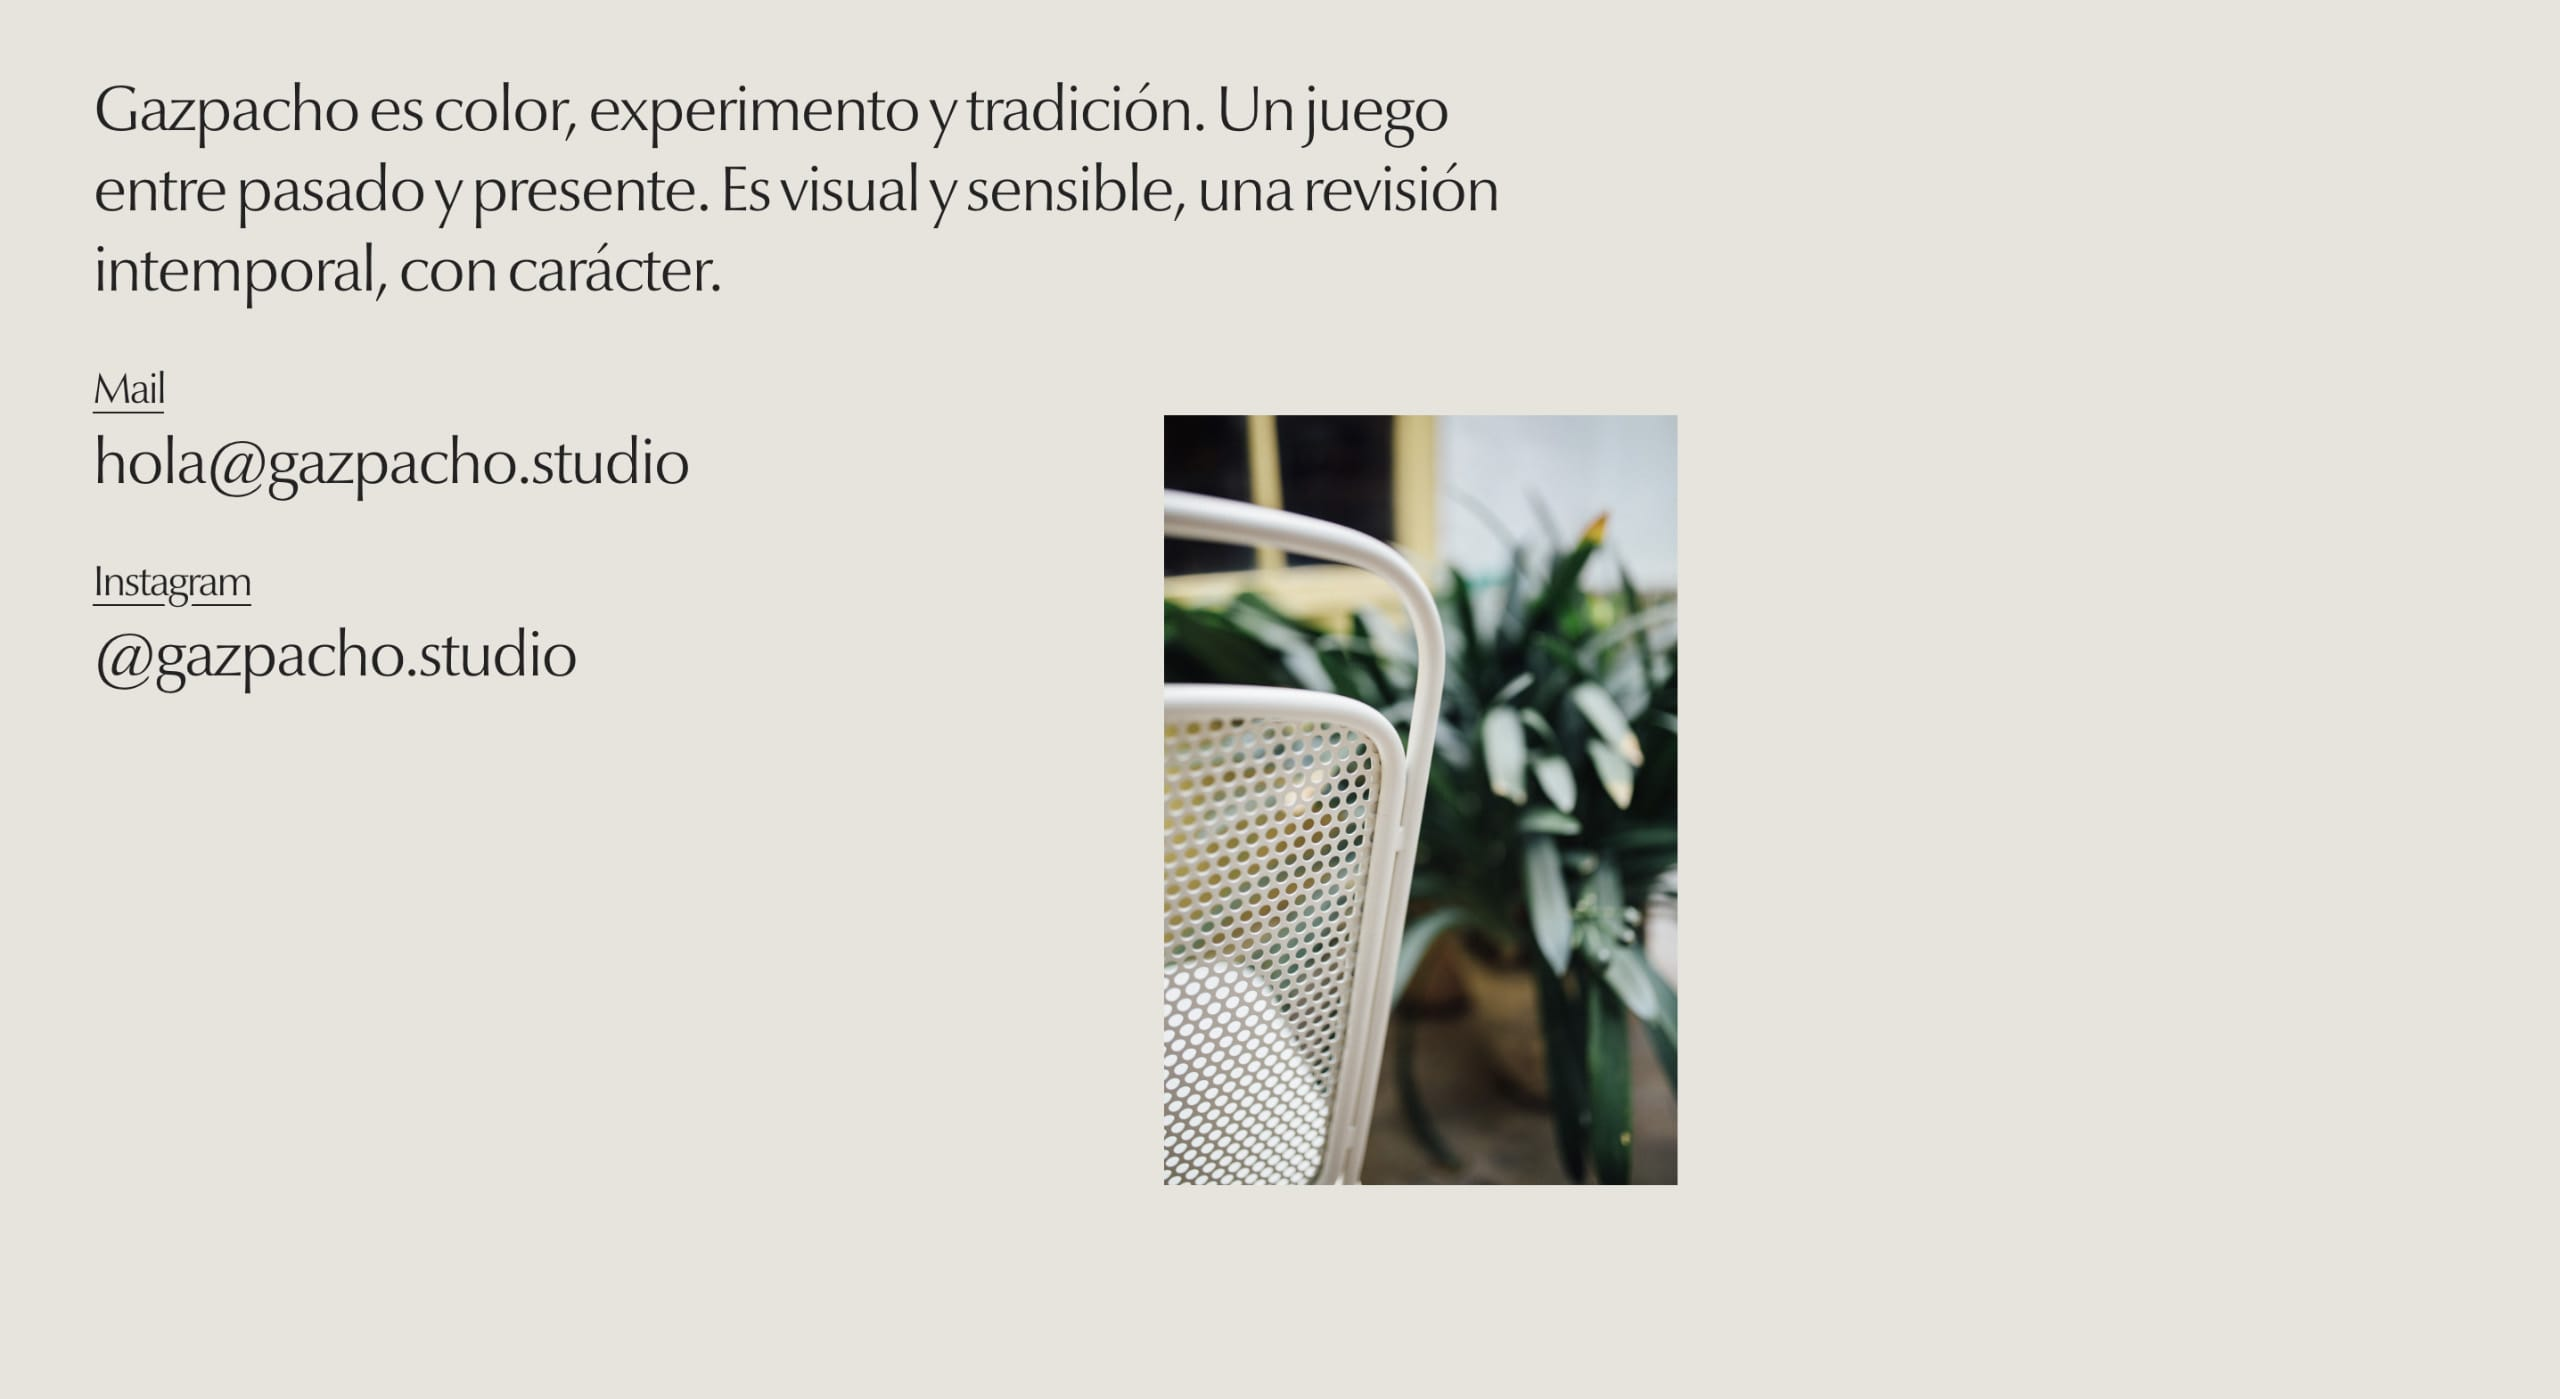 Gazpacho Website Screenshot